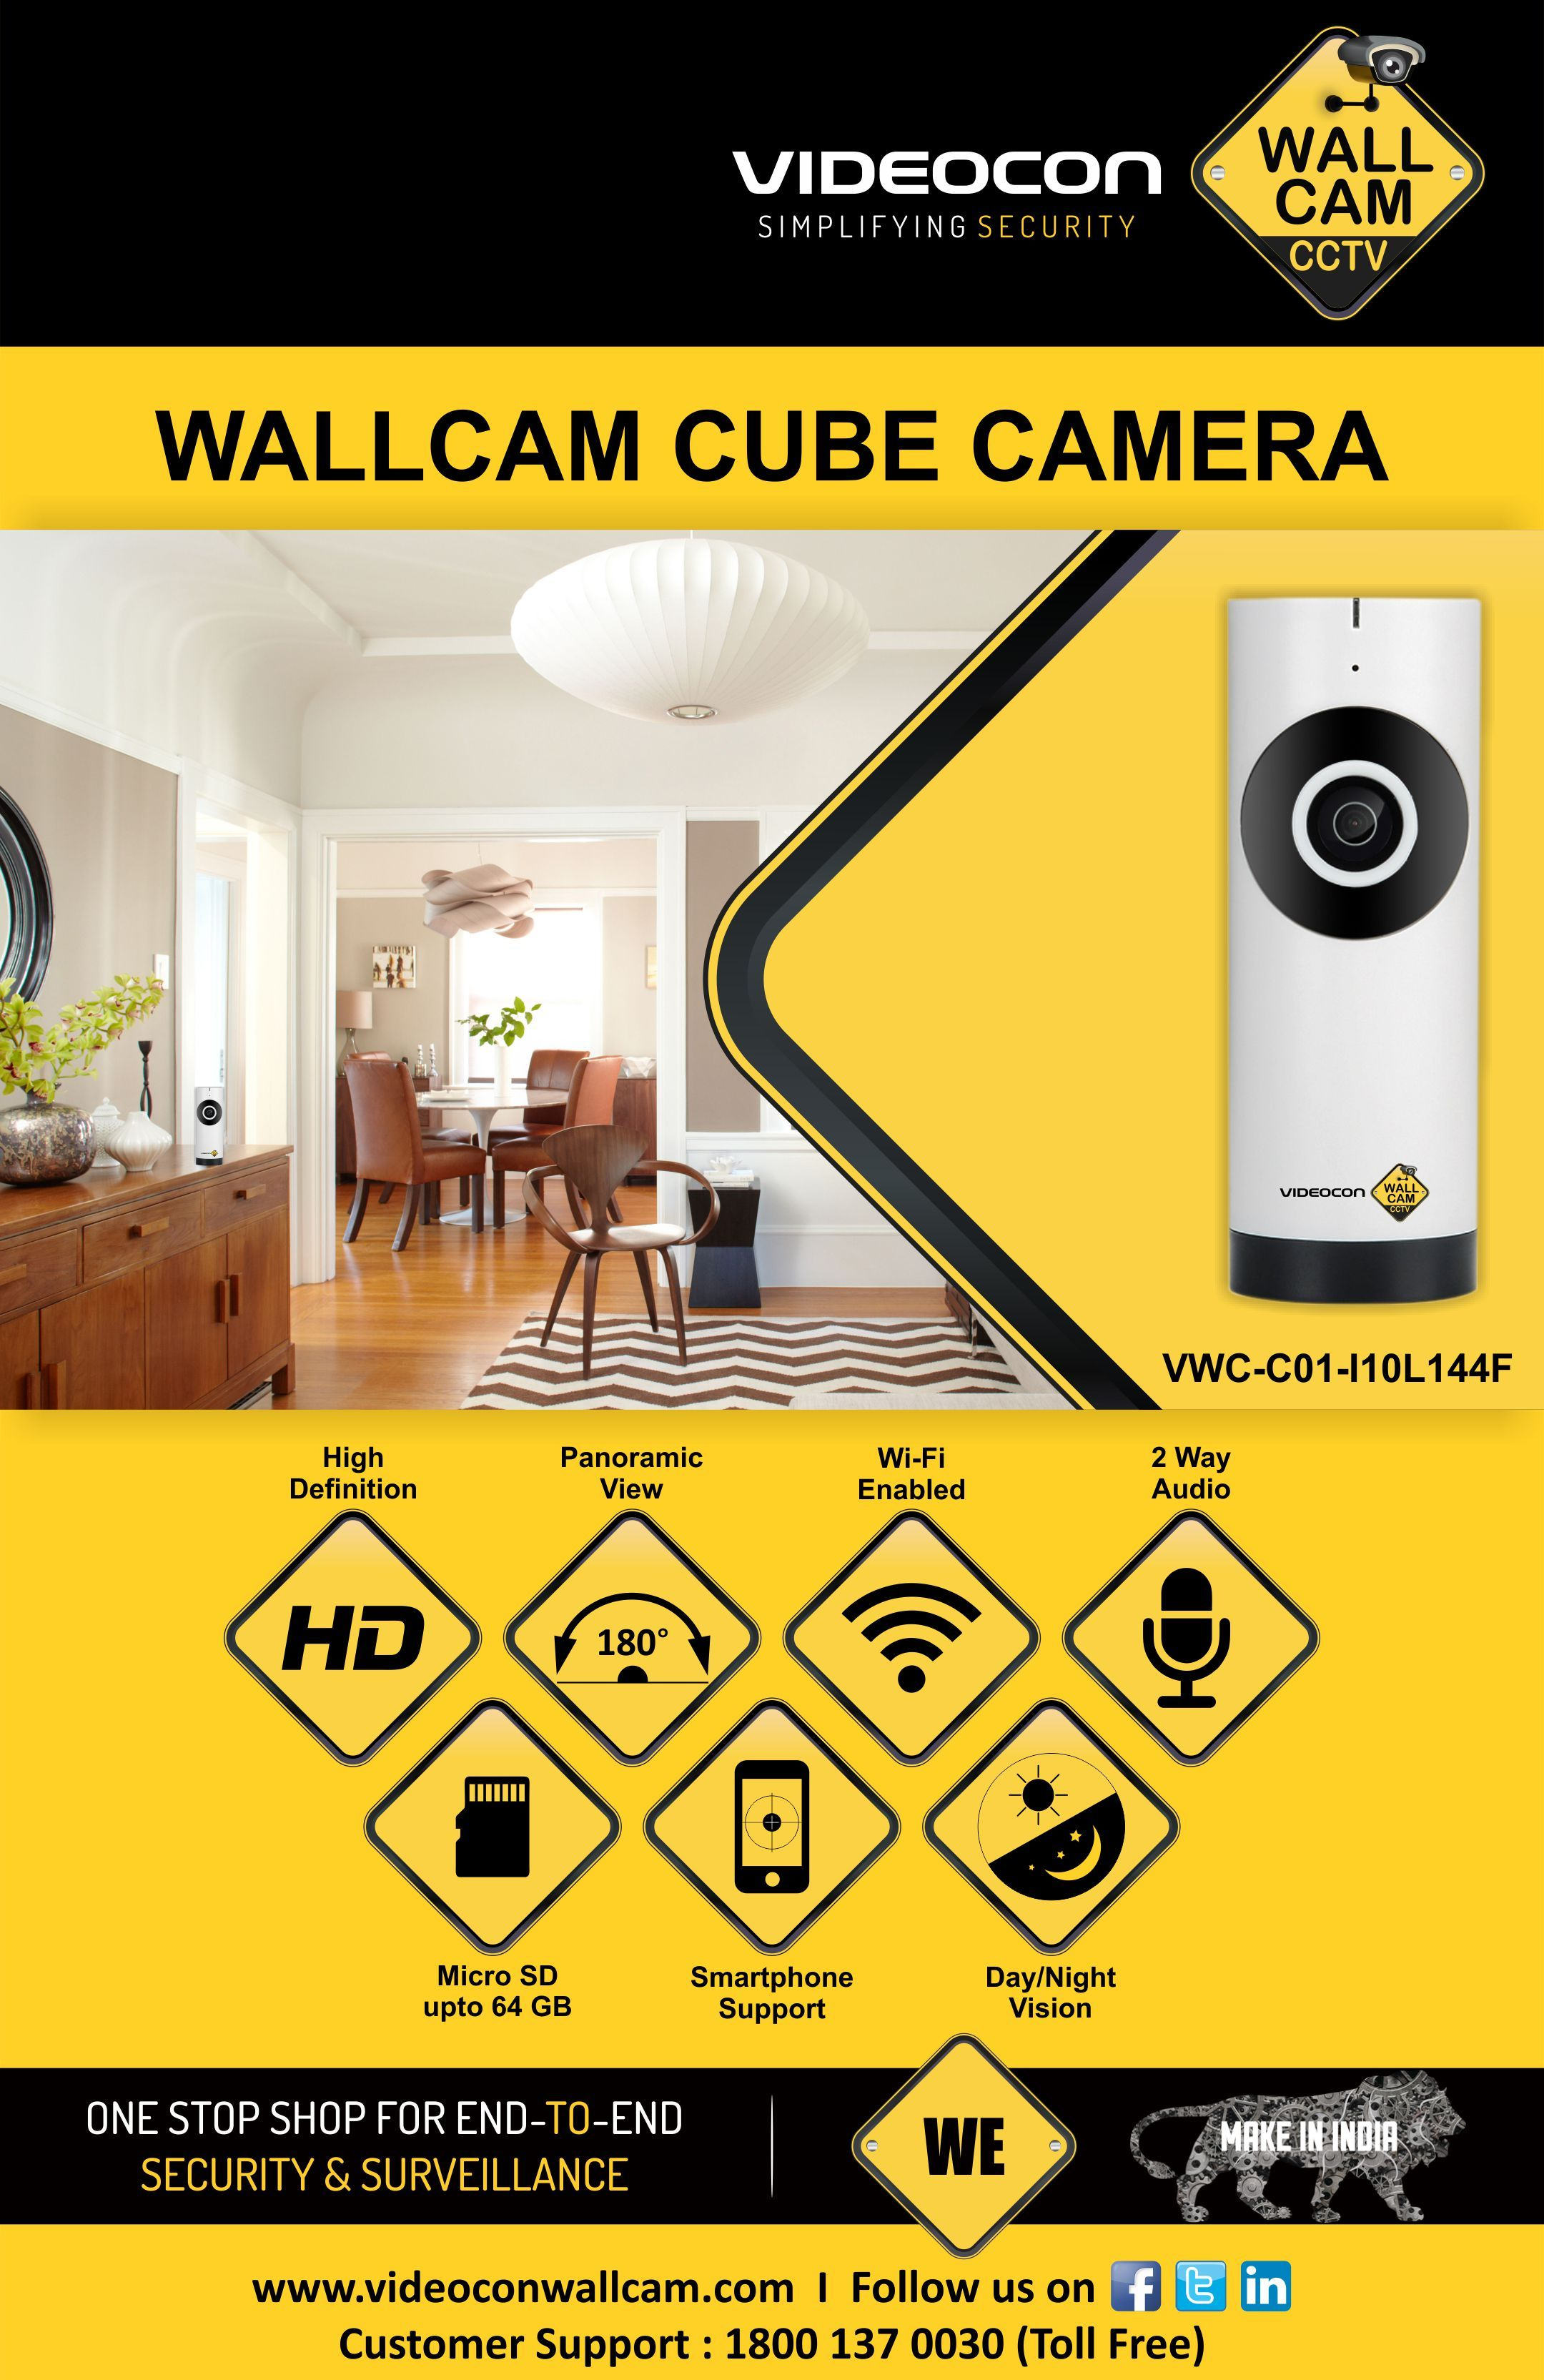 Videocon Wallcam Wifi Camera A Perfect Security Cctv For Home Diy 30 Watt Stereo Amplifier Circuit Gadgetronicx